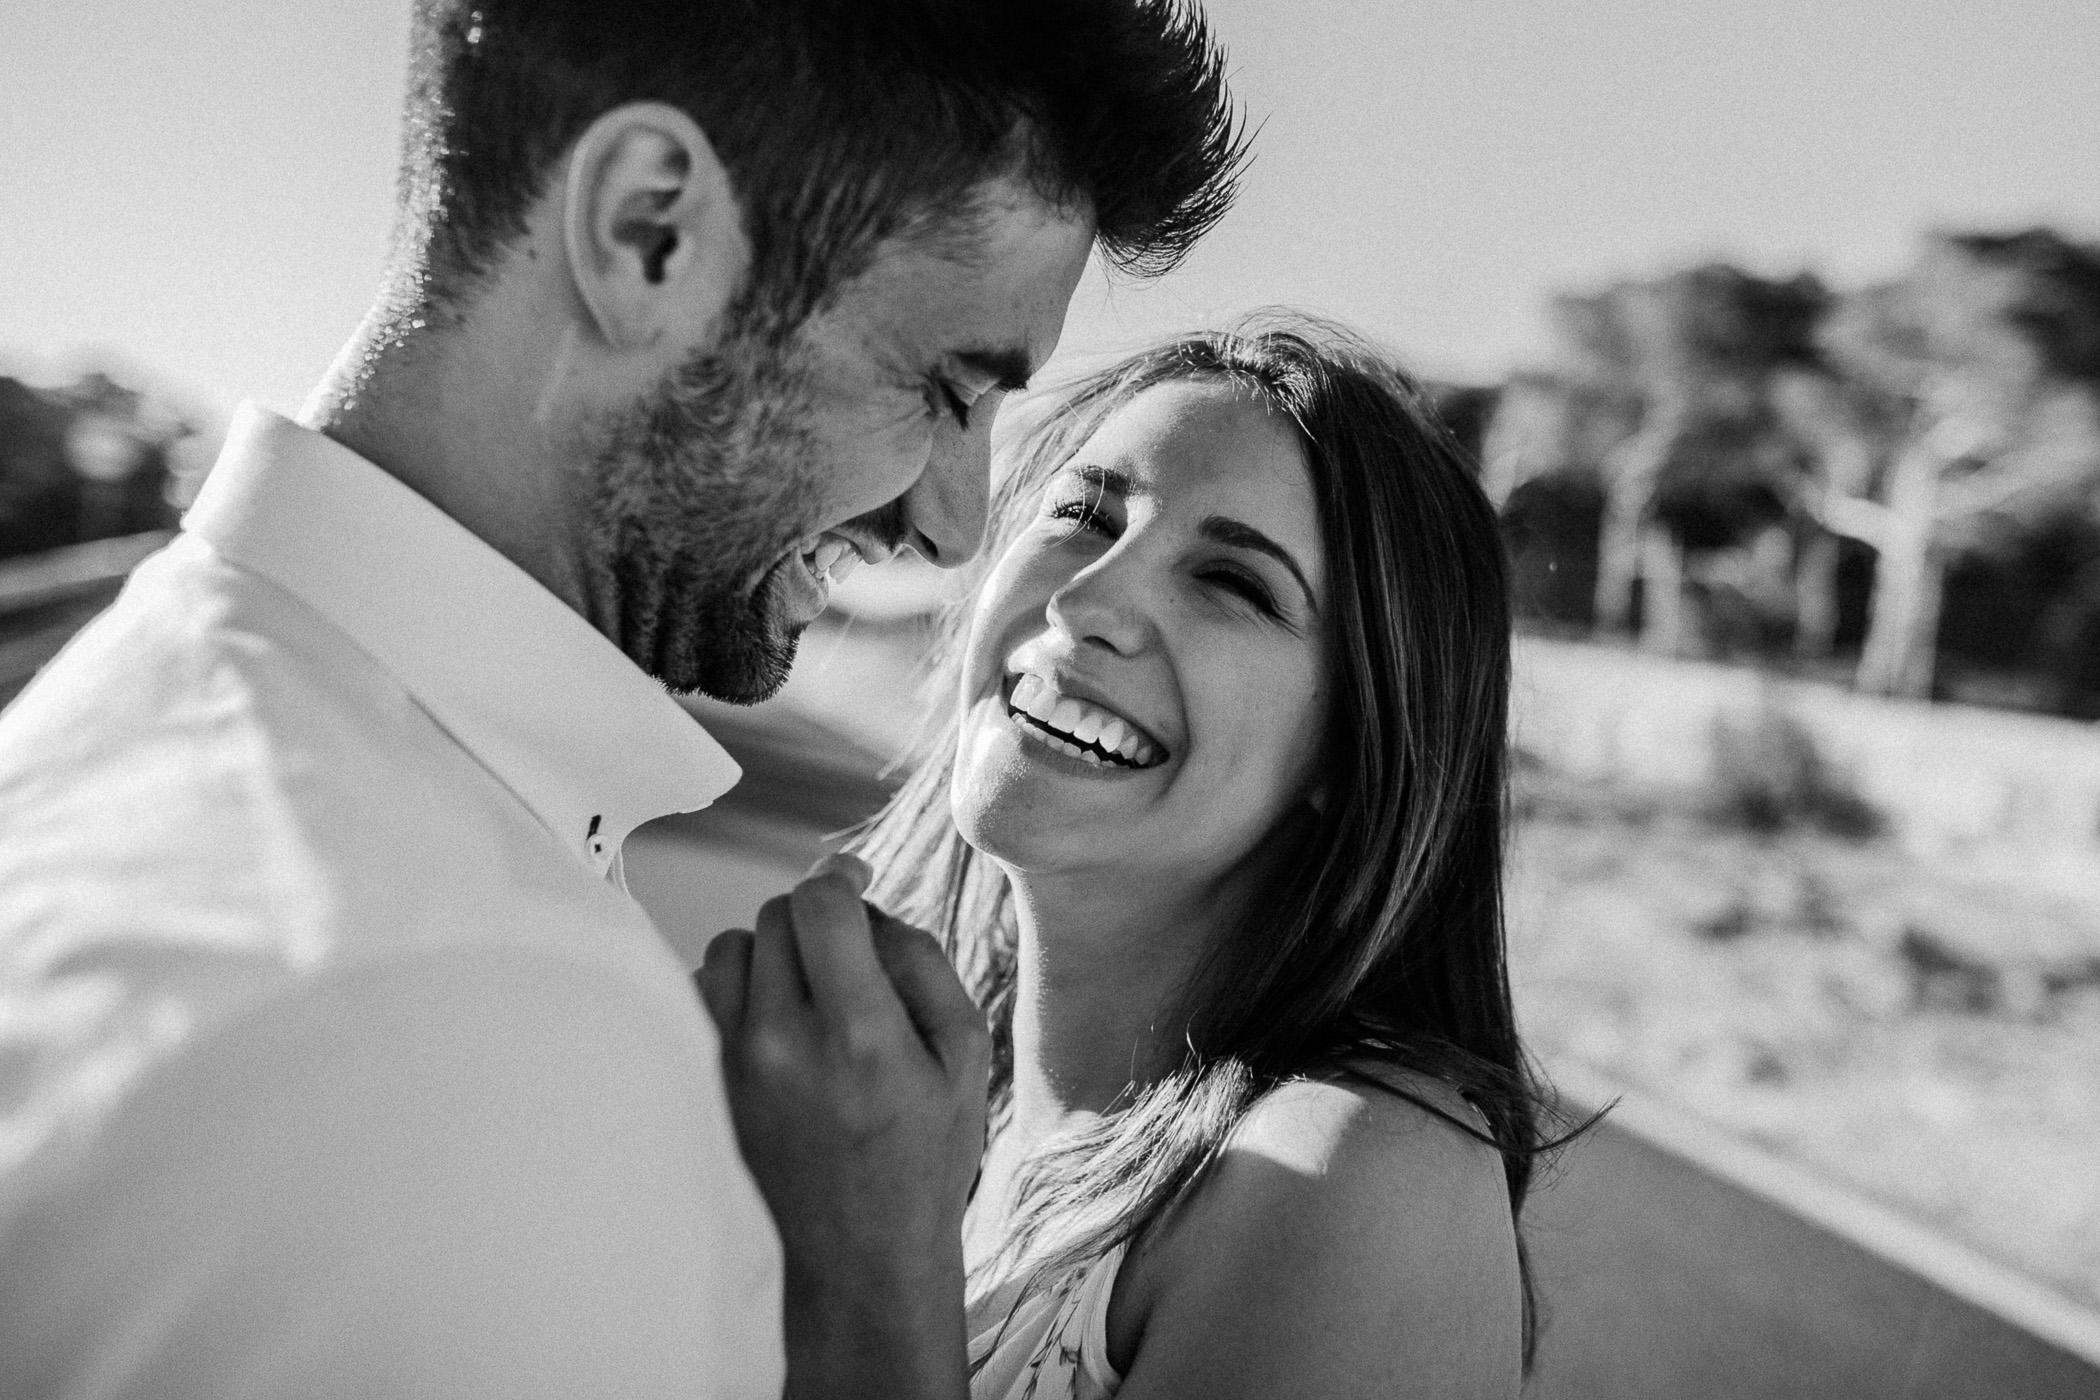 DanielaMarquardtPhotography_wedding_elopement_mallorca_spain_calapi_palma_lauraandtoni_422